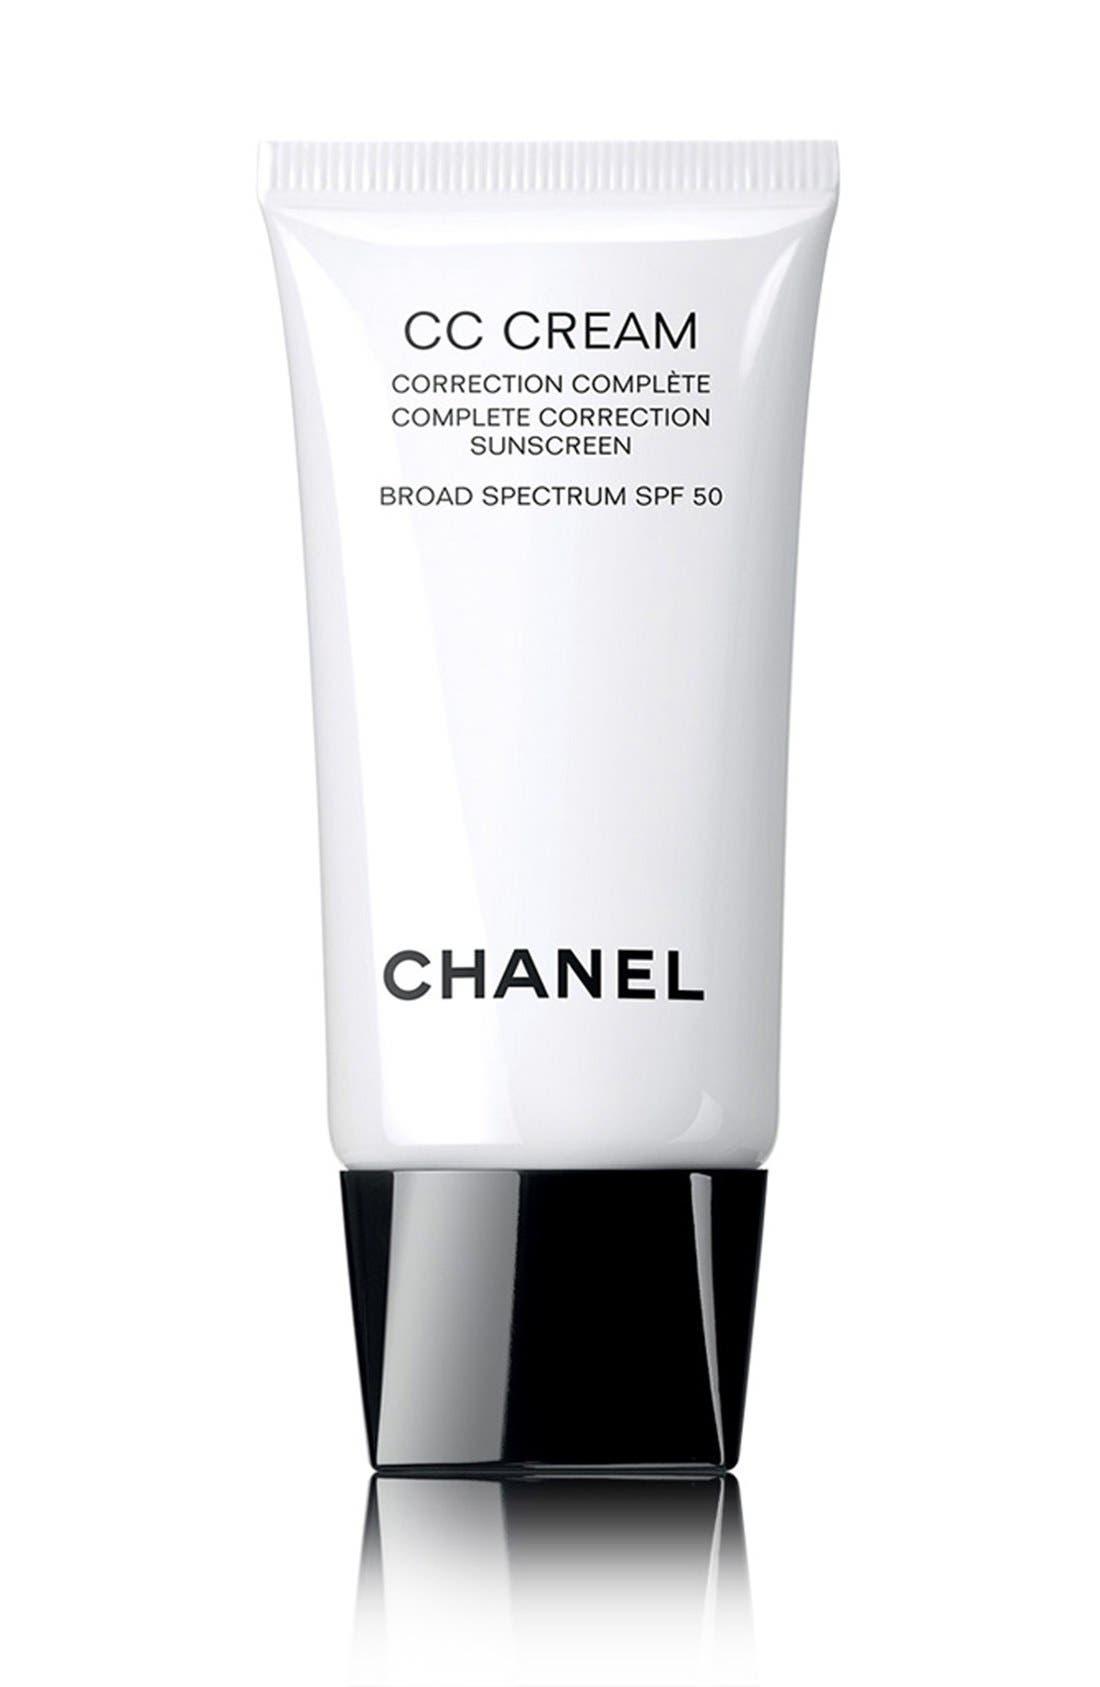 CC CREAM<br />Complete Correction Sunscreen Broad Spectrum SPF 50,                             Main thumbnail 3, color,